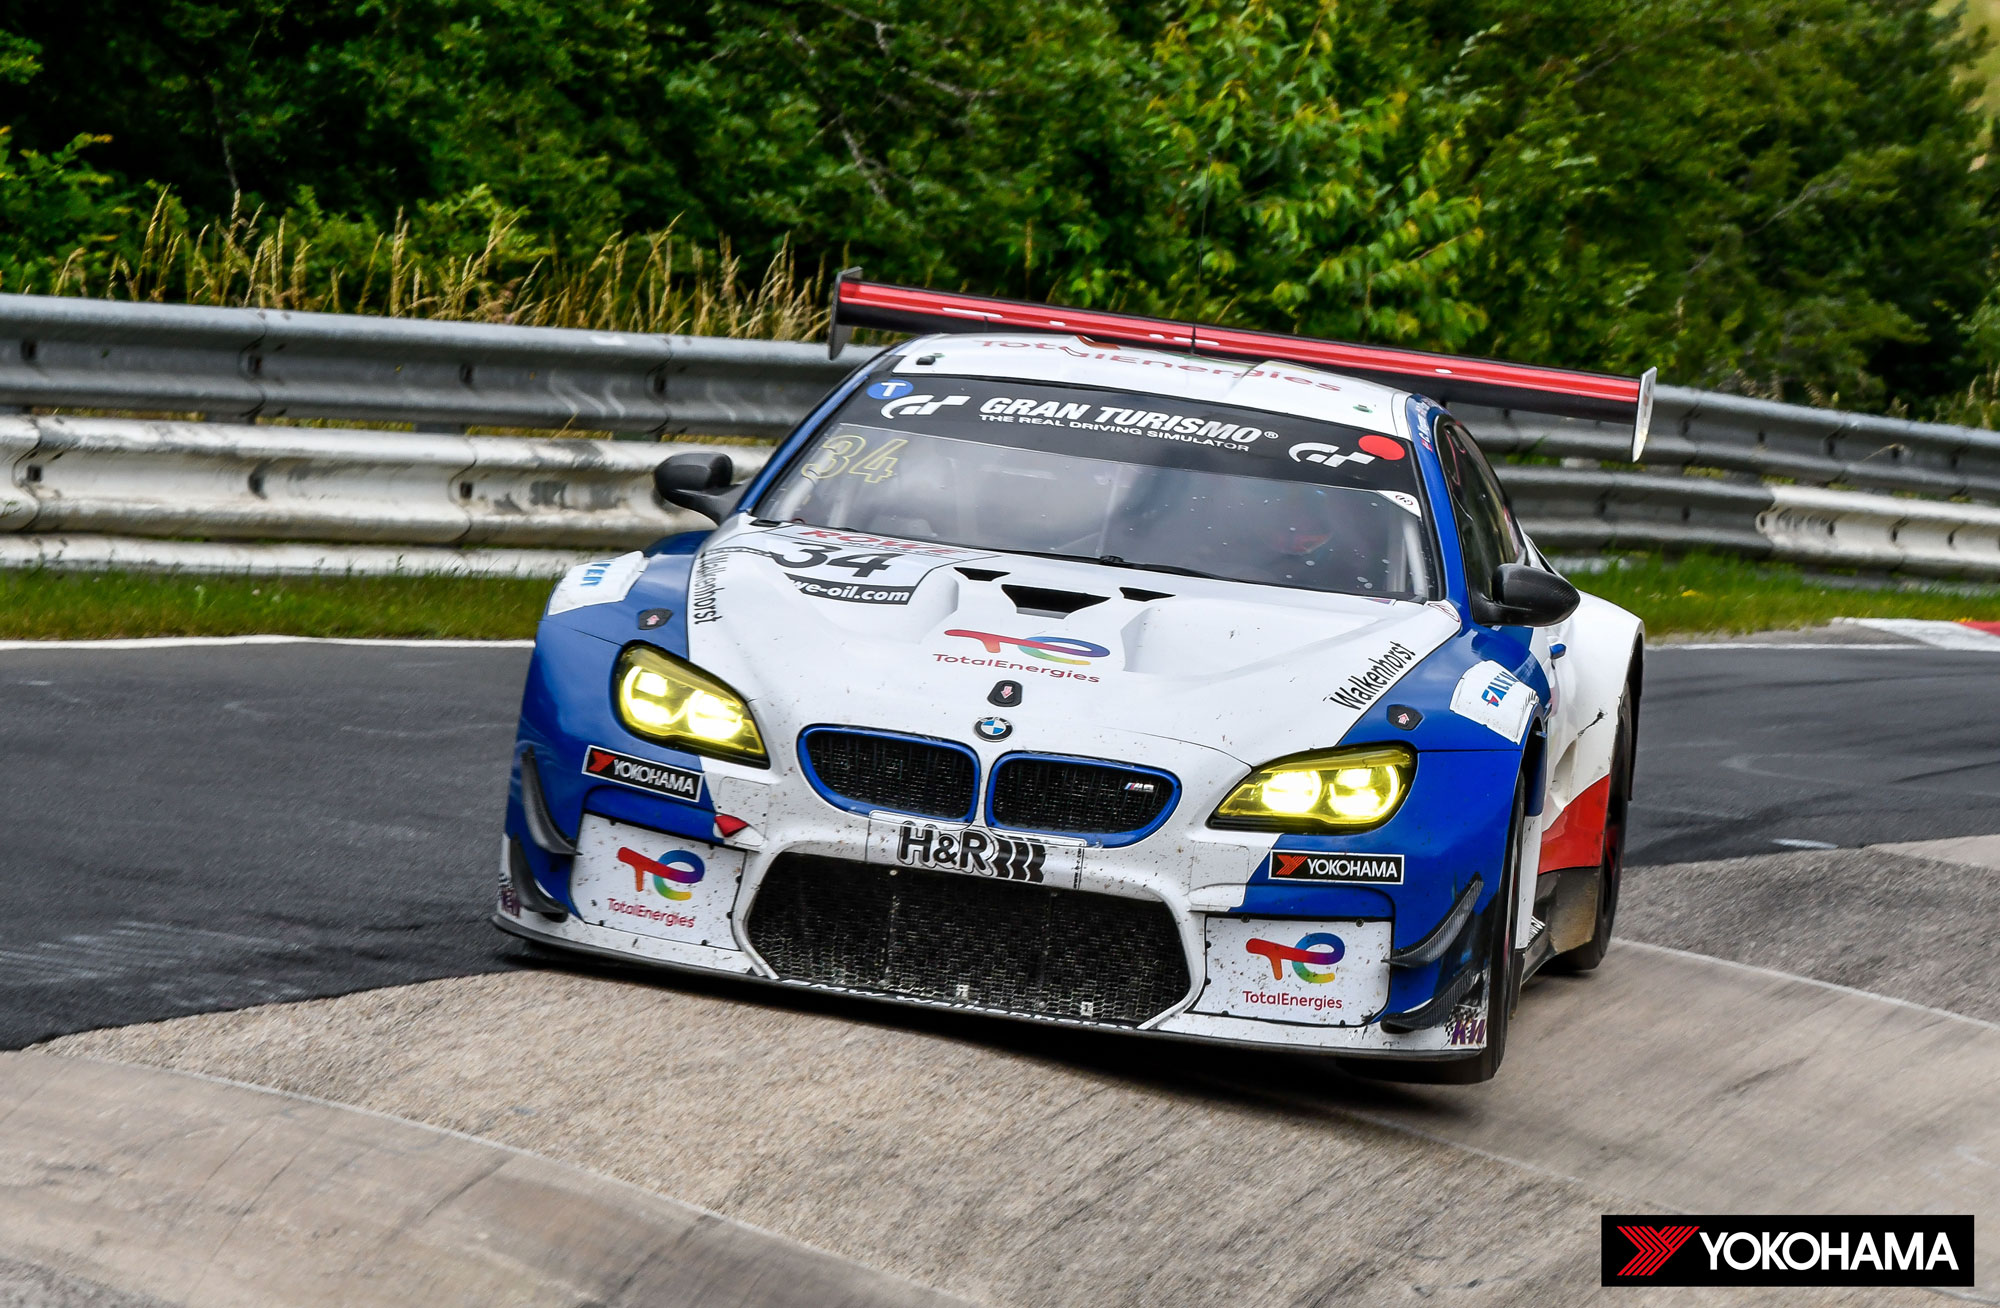 "Yokohama BMW NLS H Yokohama και η BMW ""σάρωσαν"" το Nurburgring BMW, Racing Team, YOKOHAMA, YOKOHAMA ADVAN"